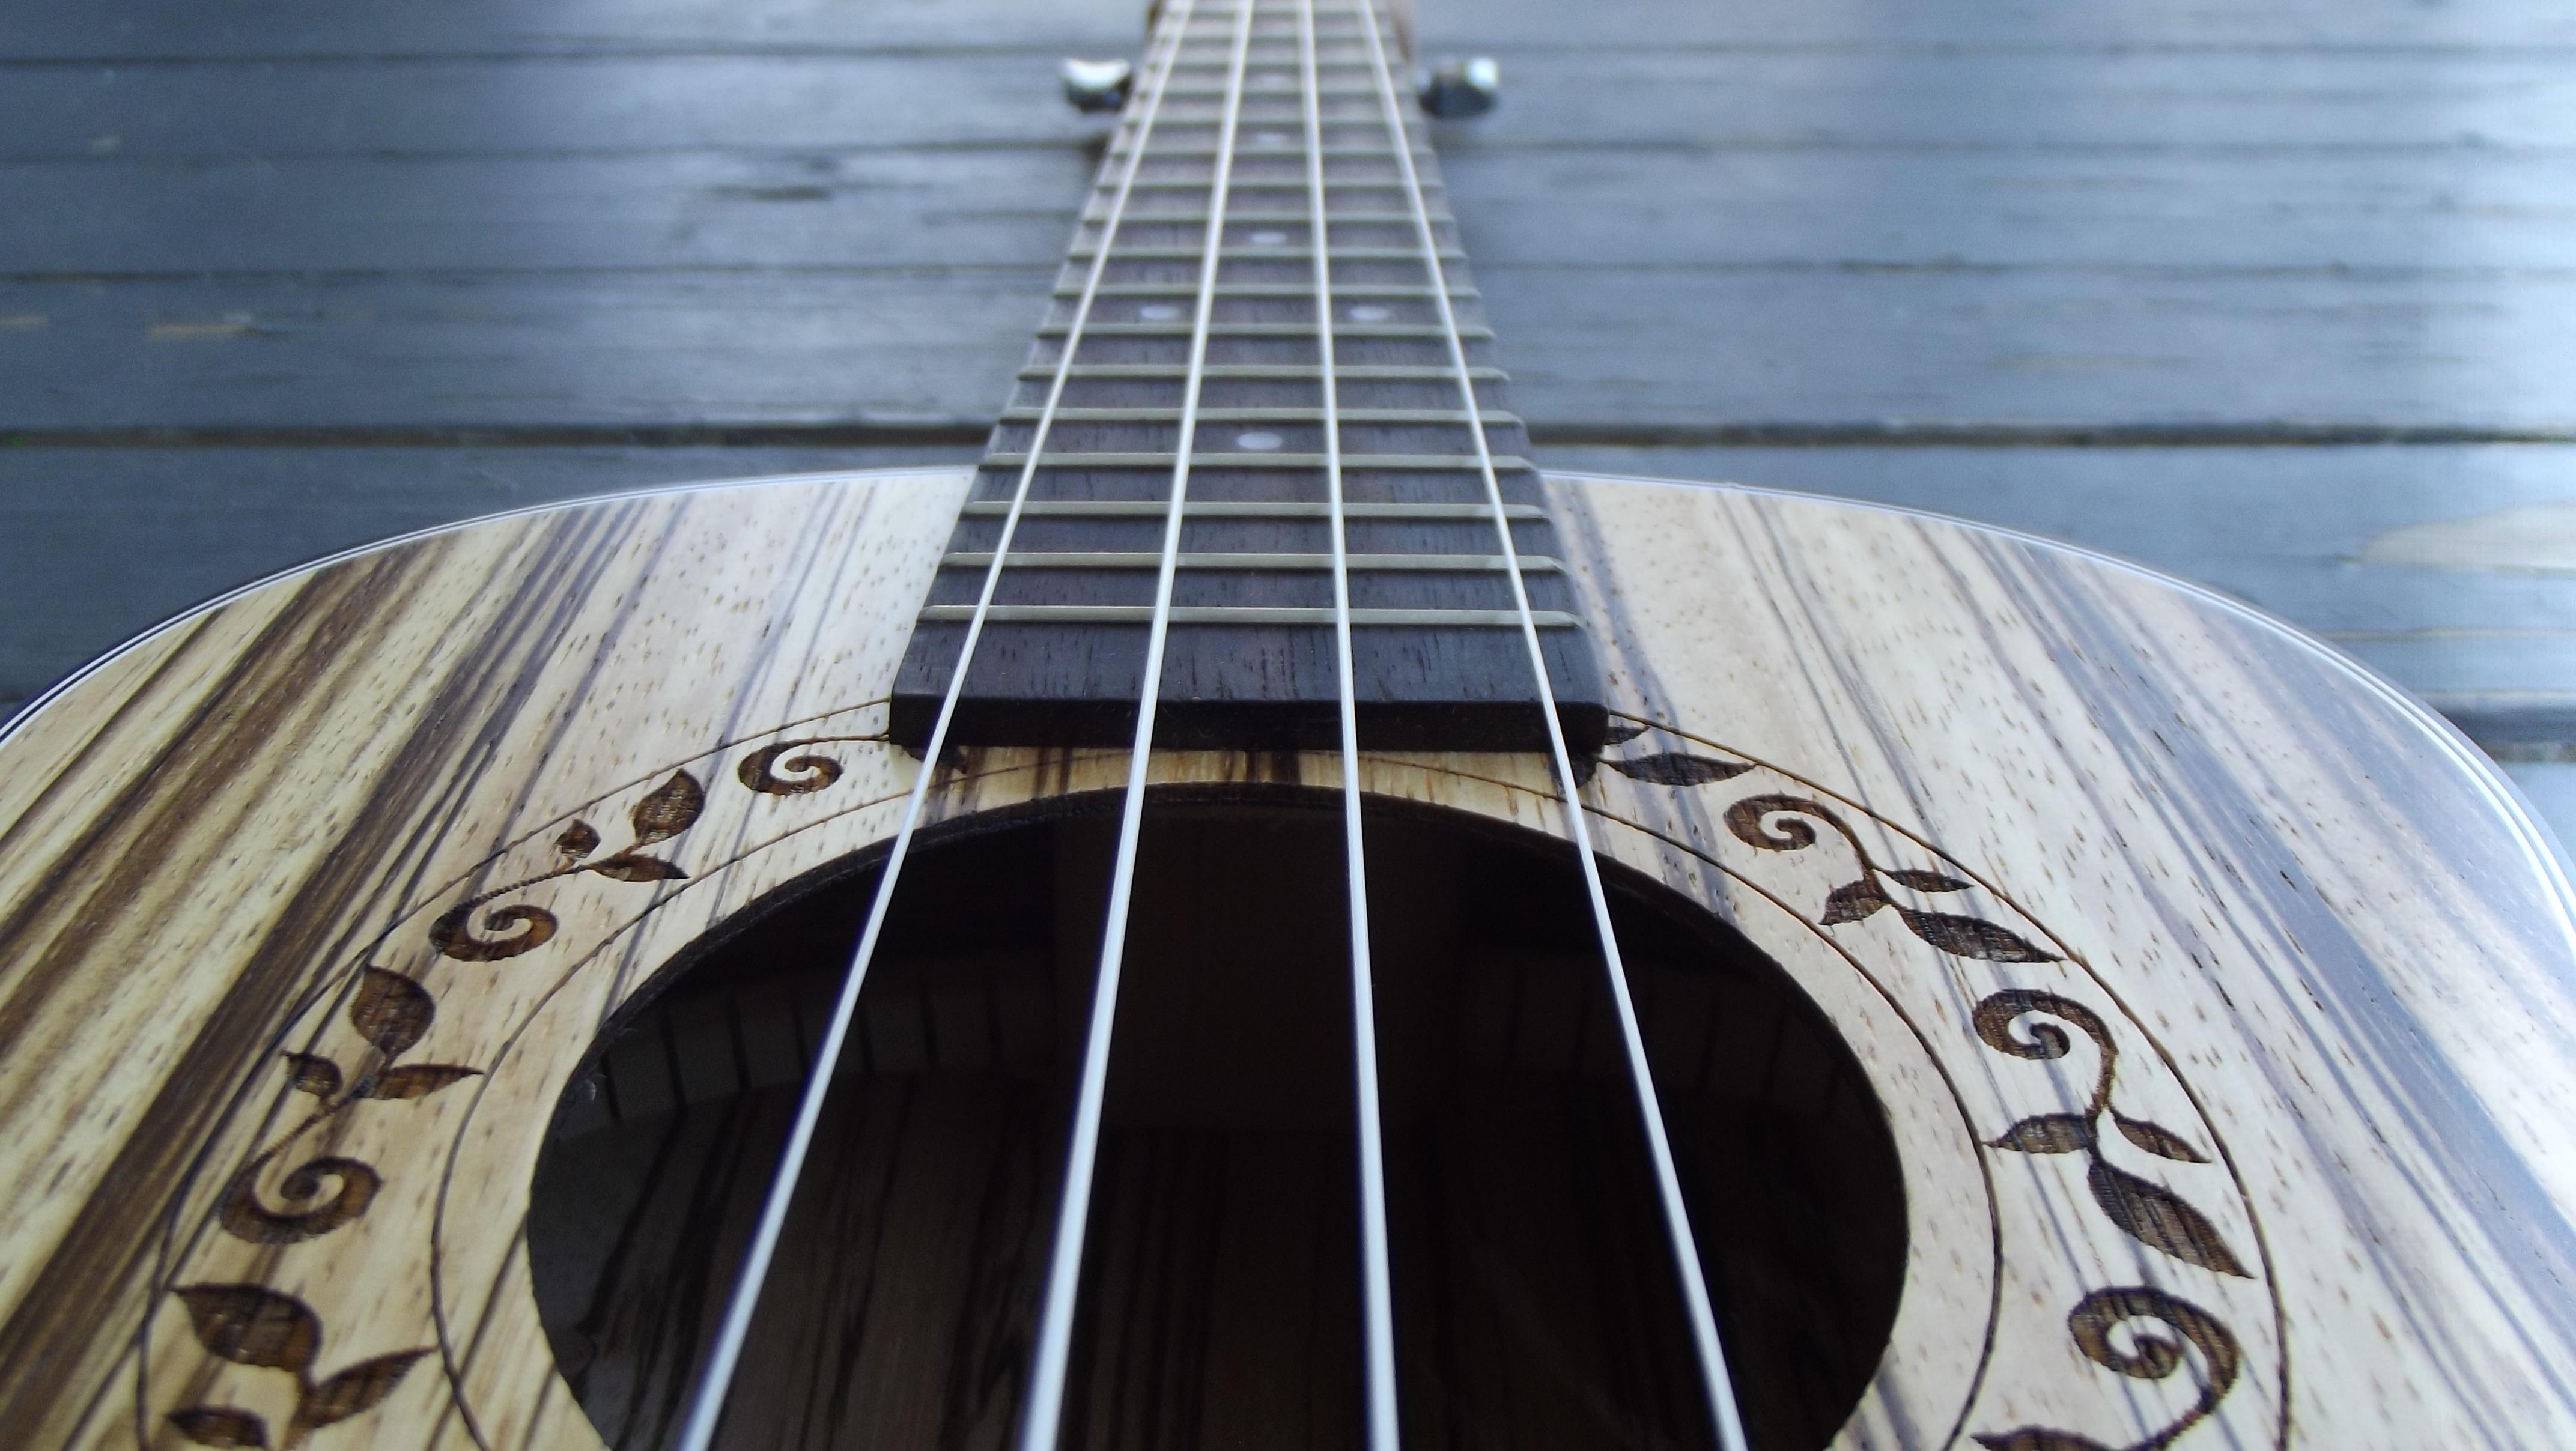 free images music acoustic guitar hawaii closeup musical instrument ukulele culture. Black Bedroom Furniture Sets. Home Design Ideas